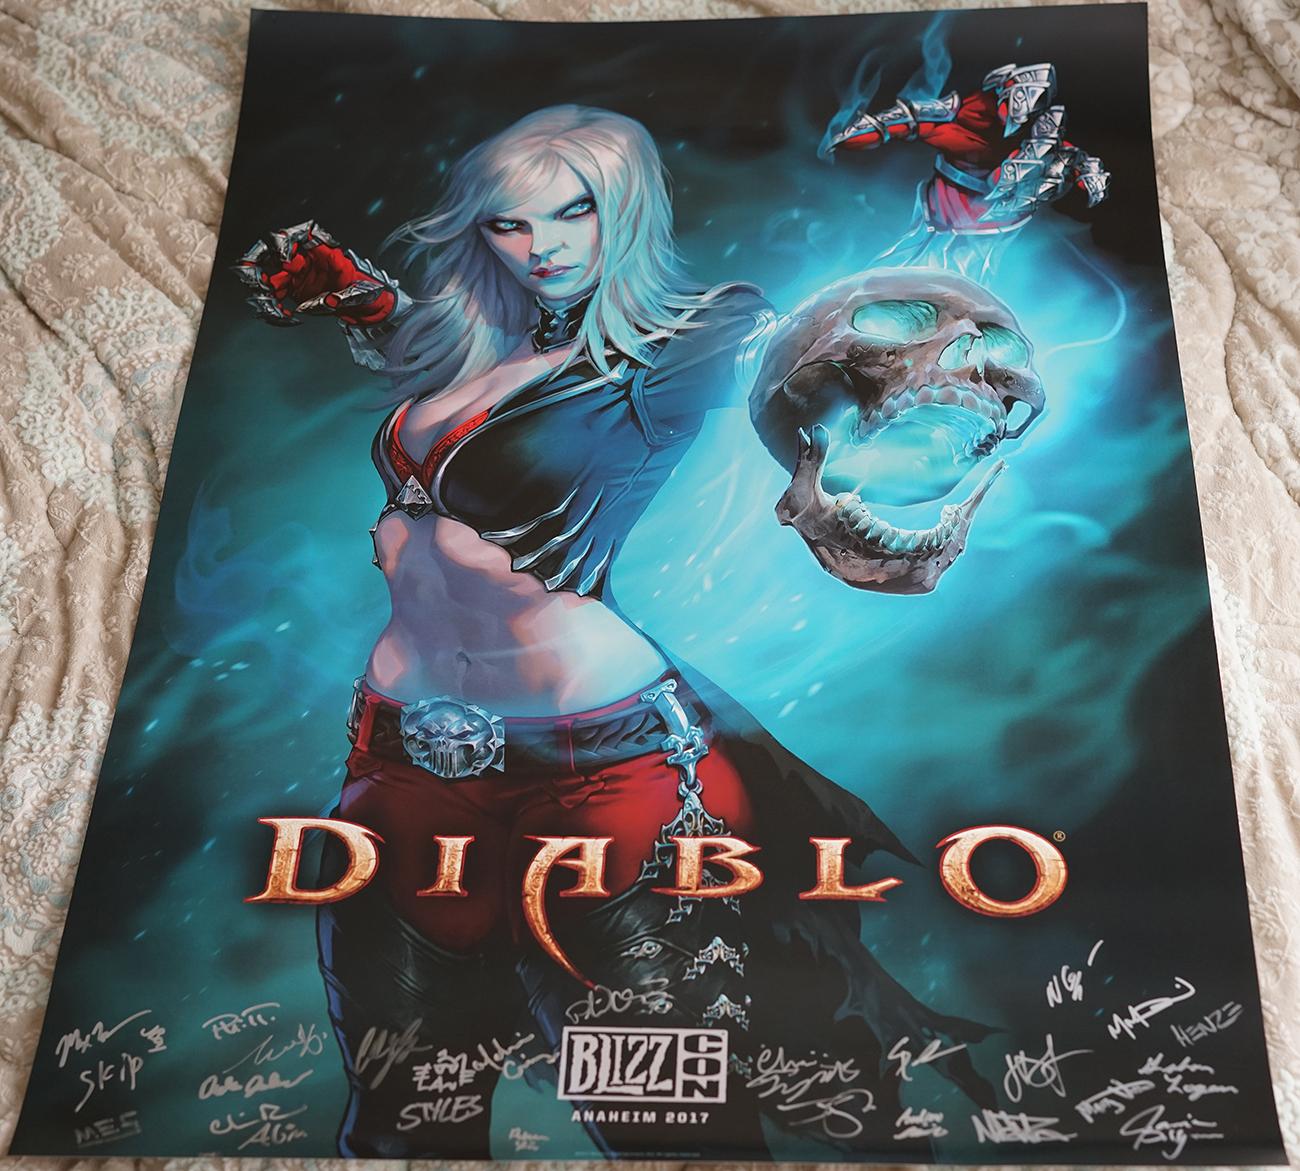 Diablo 3 Poster by Wraether on DeviantArt  |Diablo Iii Poster